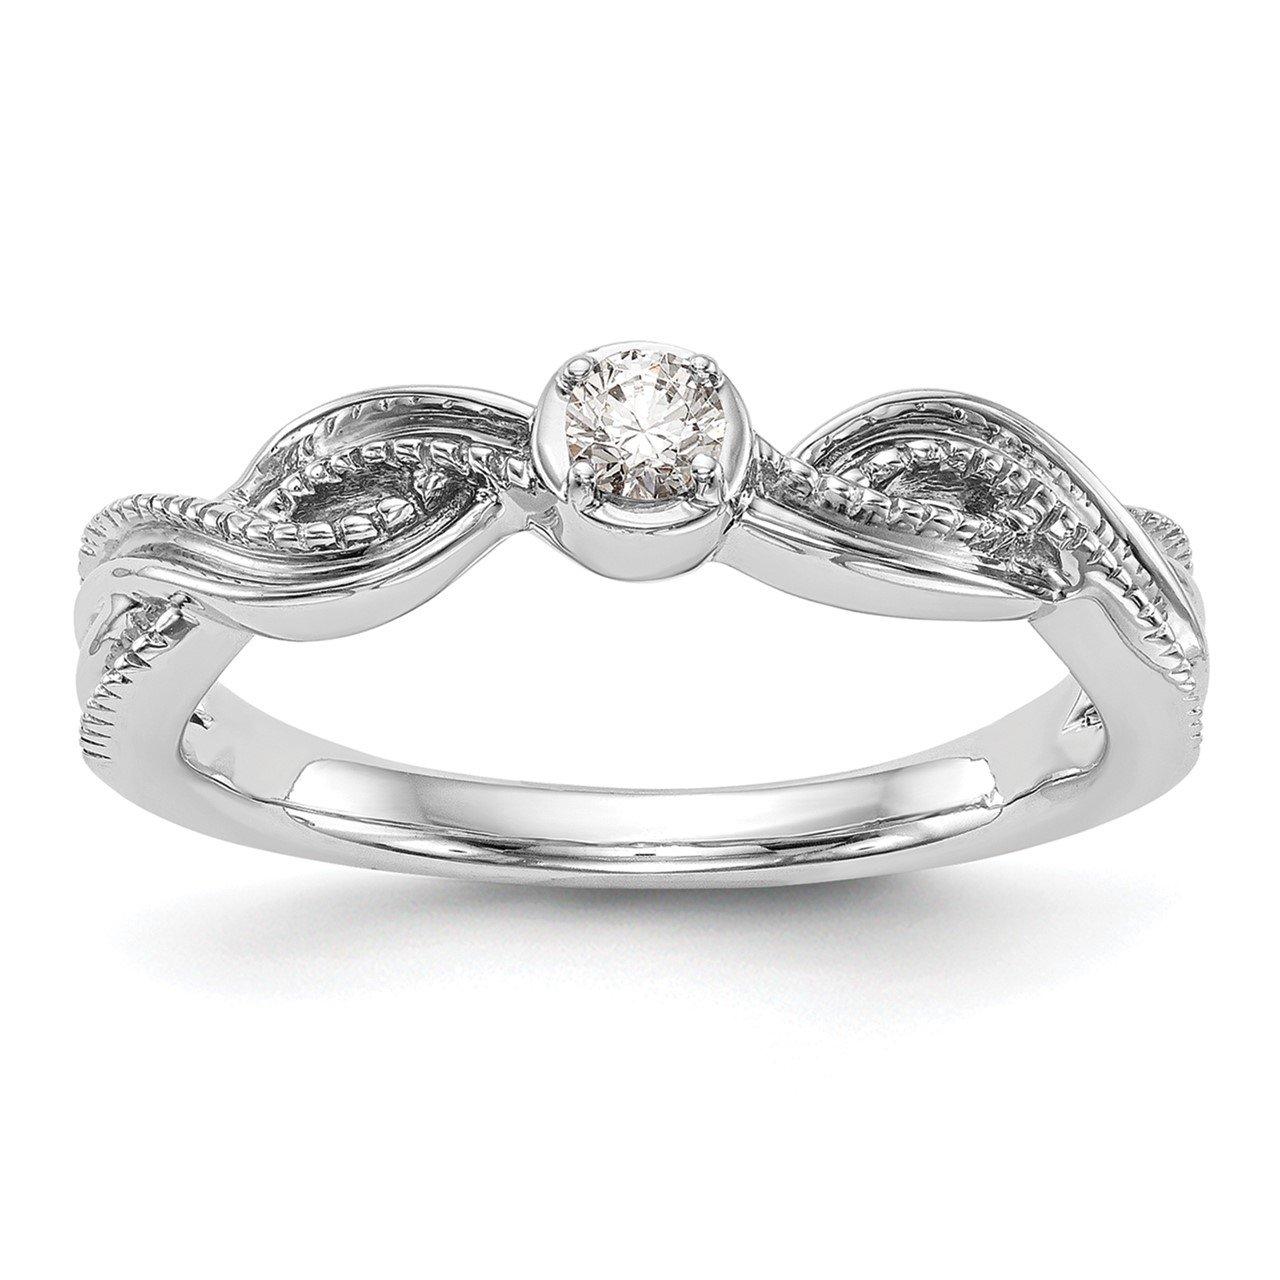 14K White Gold Complete Diamond Promise/Engagement Ring